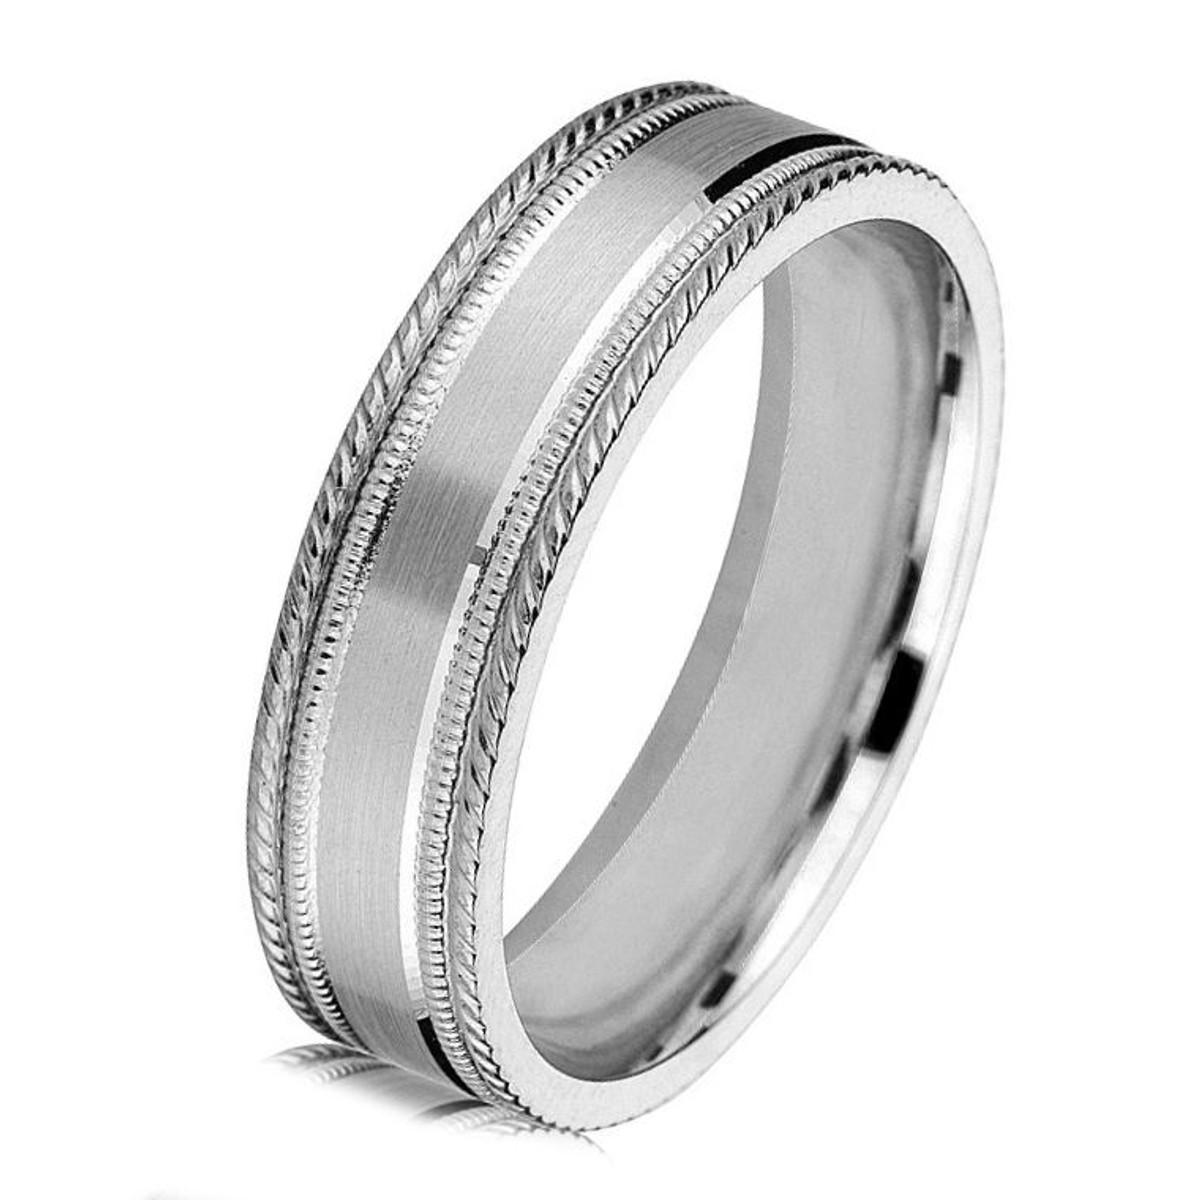 White Gold Classic Wedding Ring